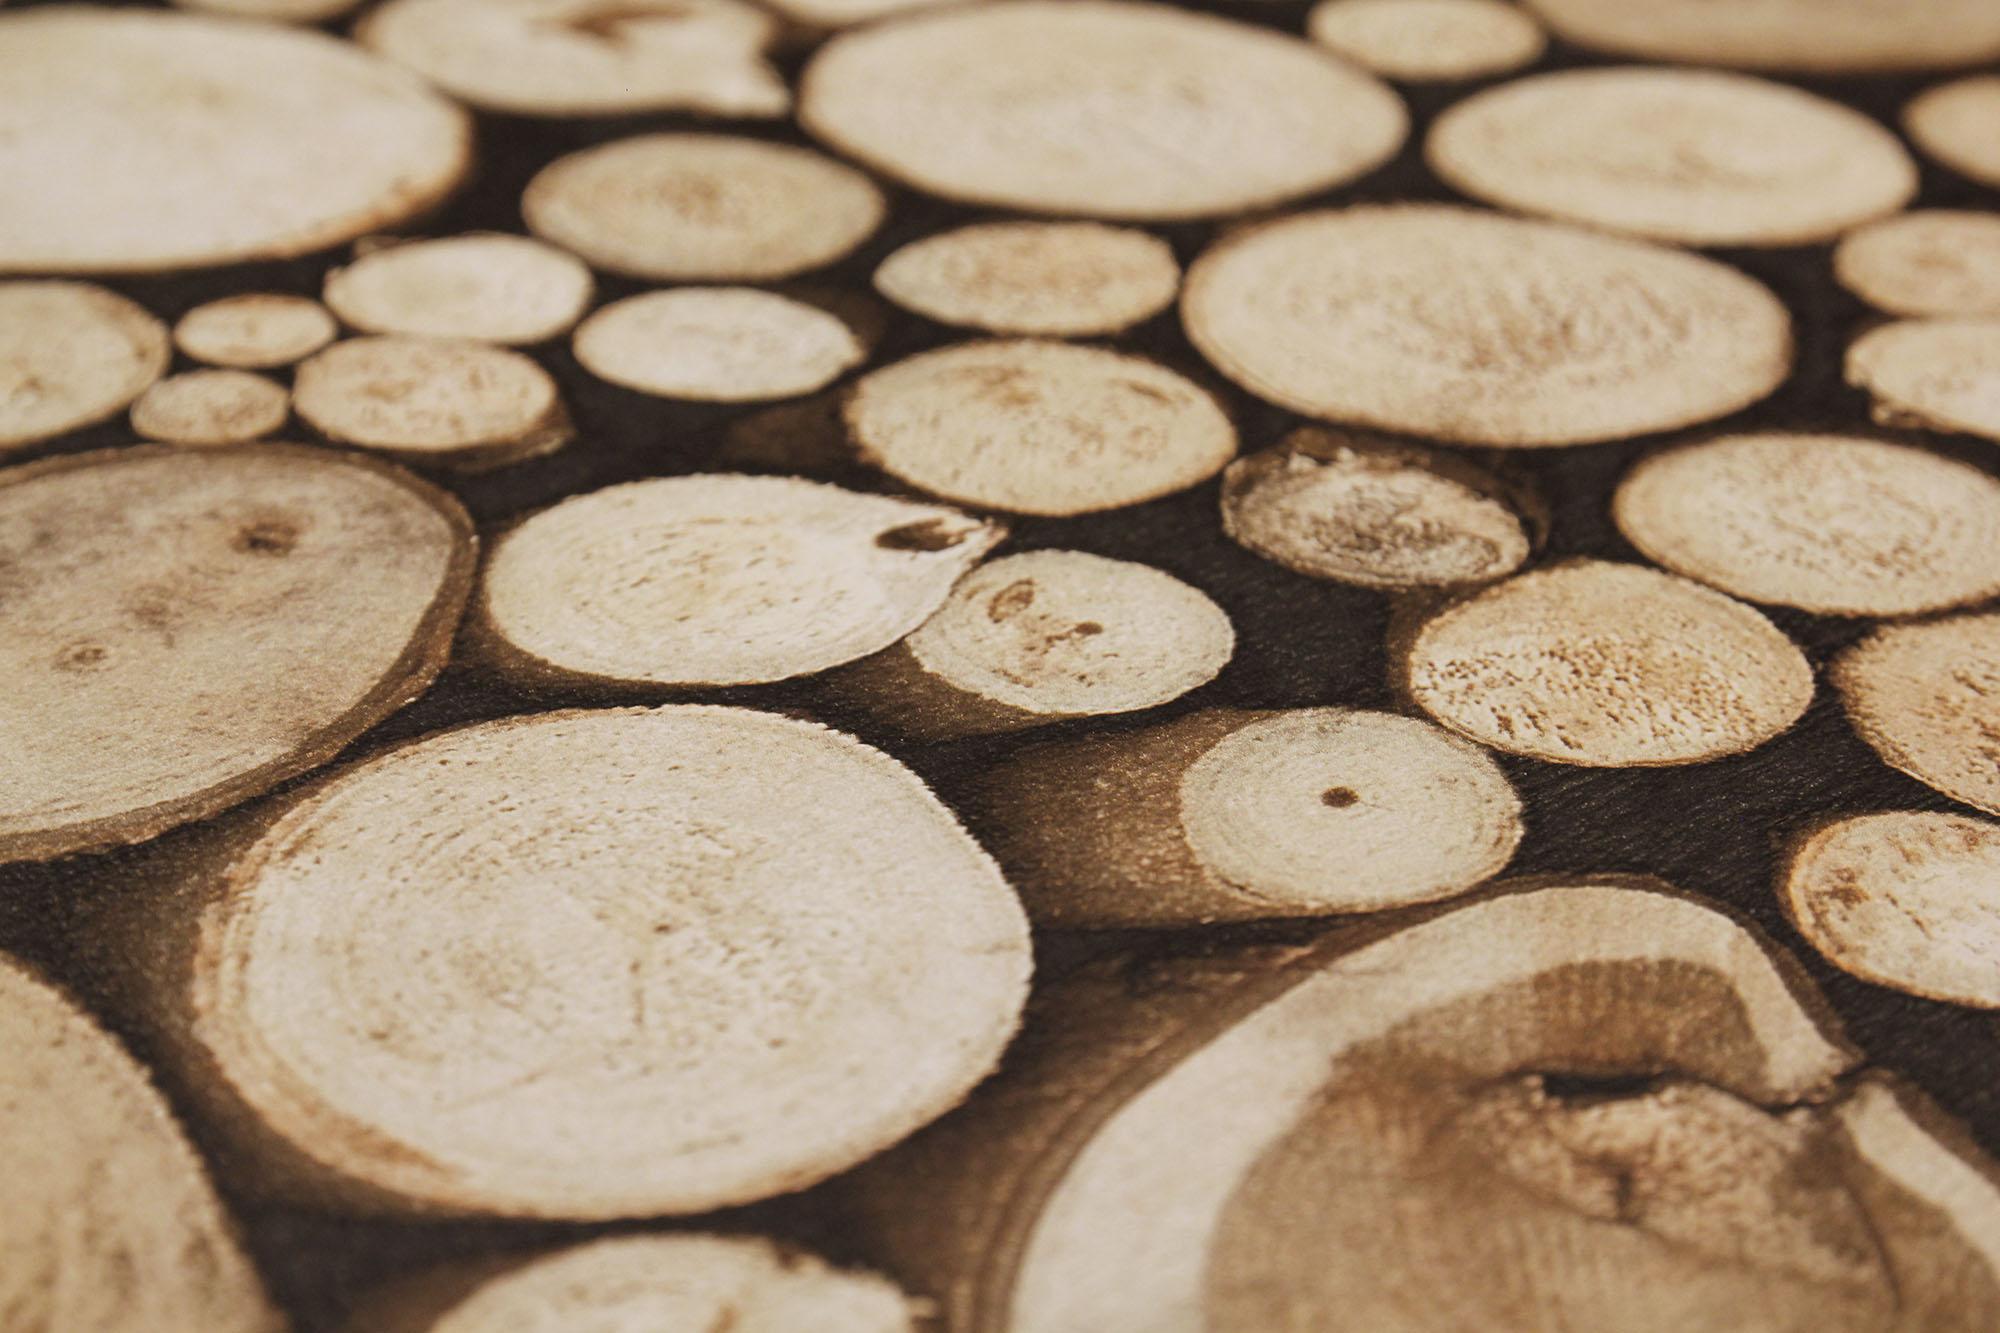 Tapete Holz Muster Design beige braun Baumstamm skandinavisch Tapeten NEU  eBay